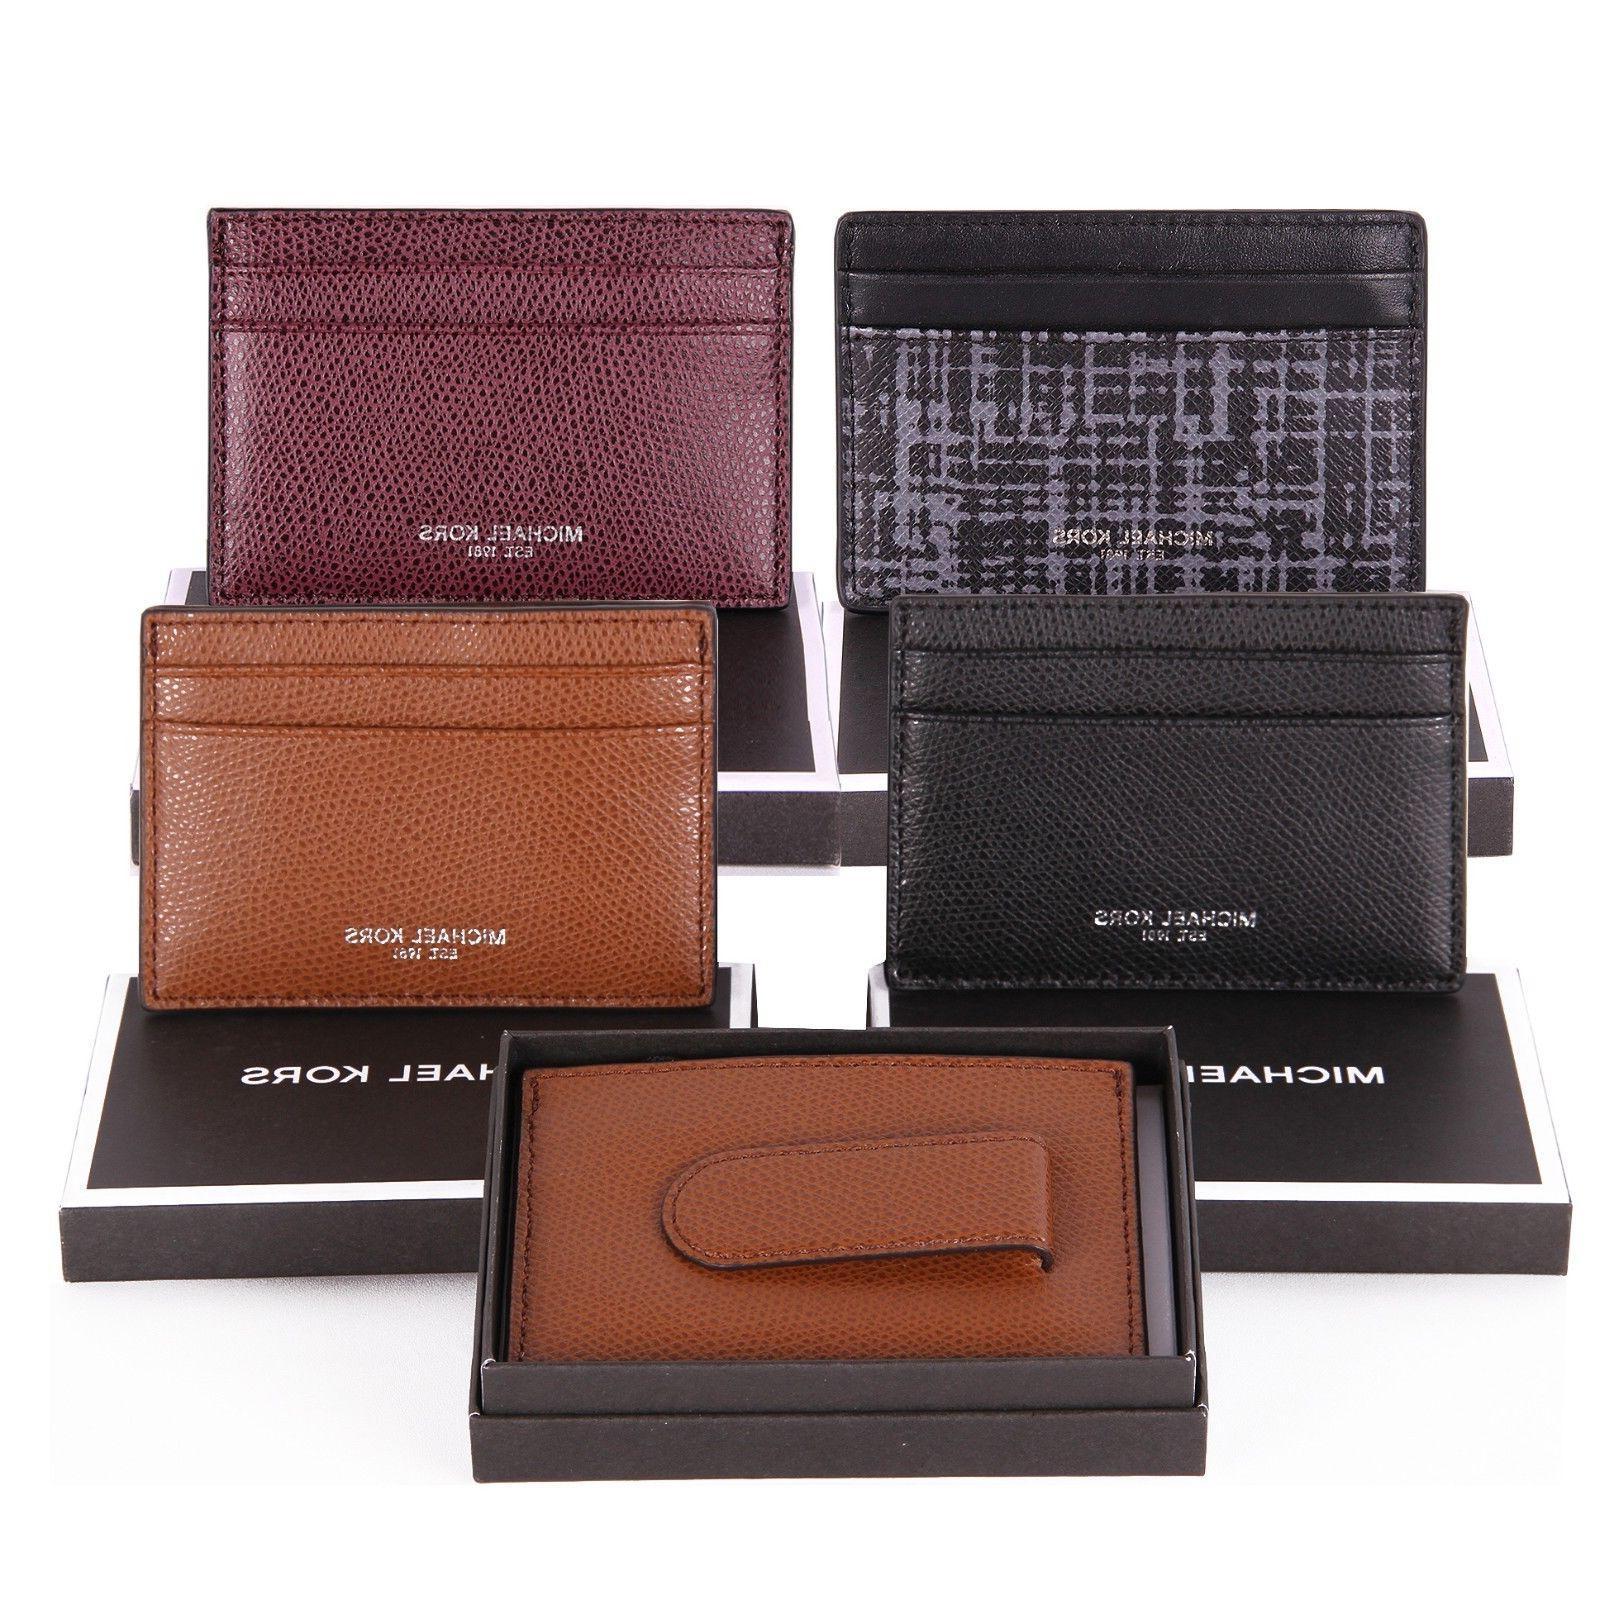 NWT Michael Kors Mens WARREN Leather Card Holder Case Money